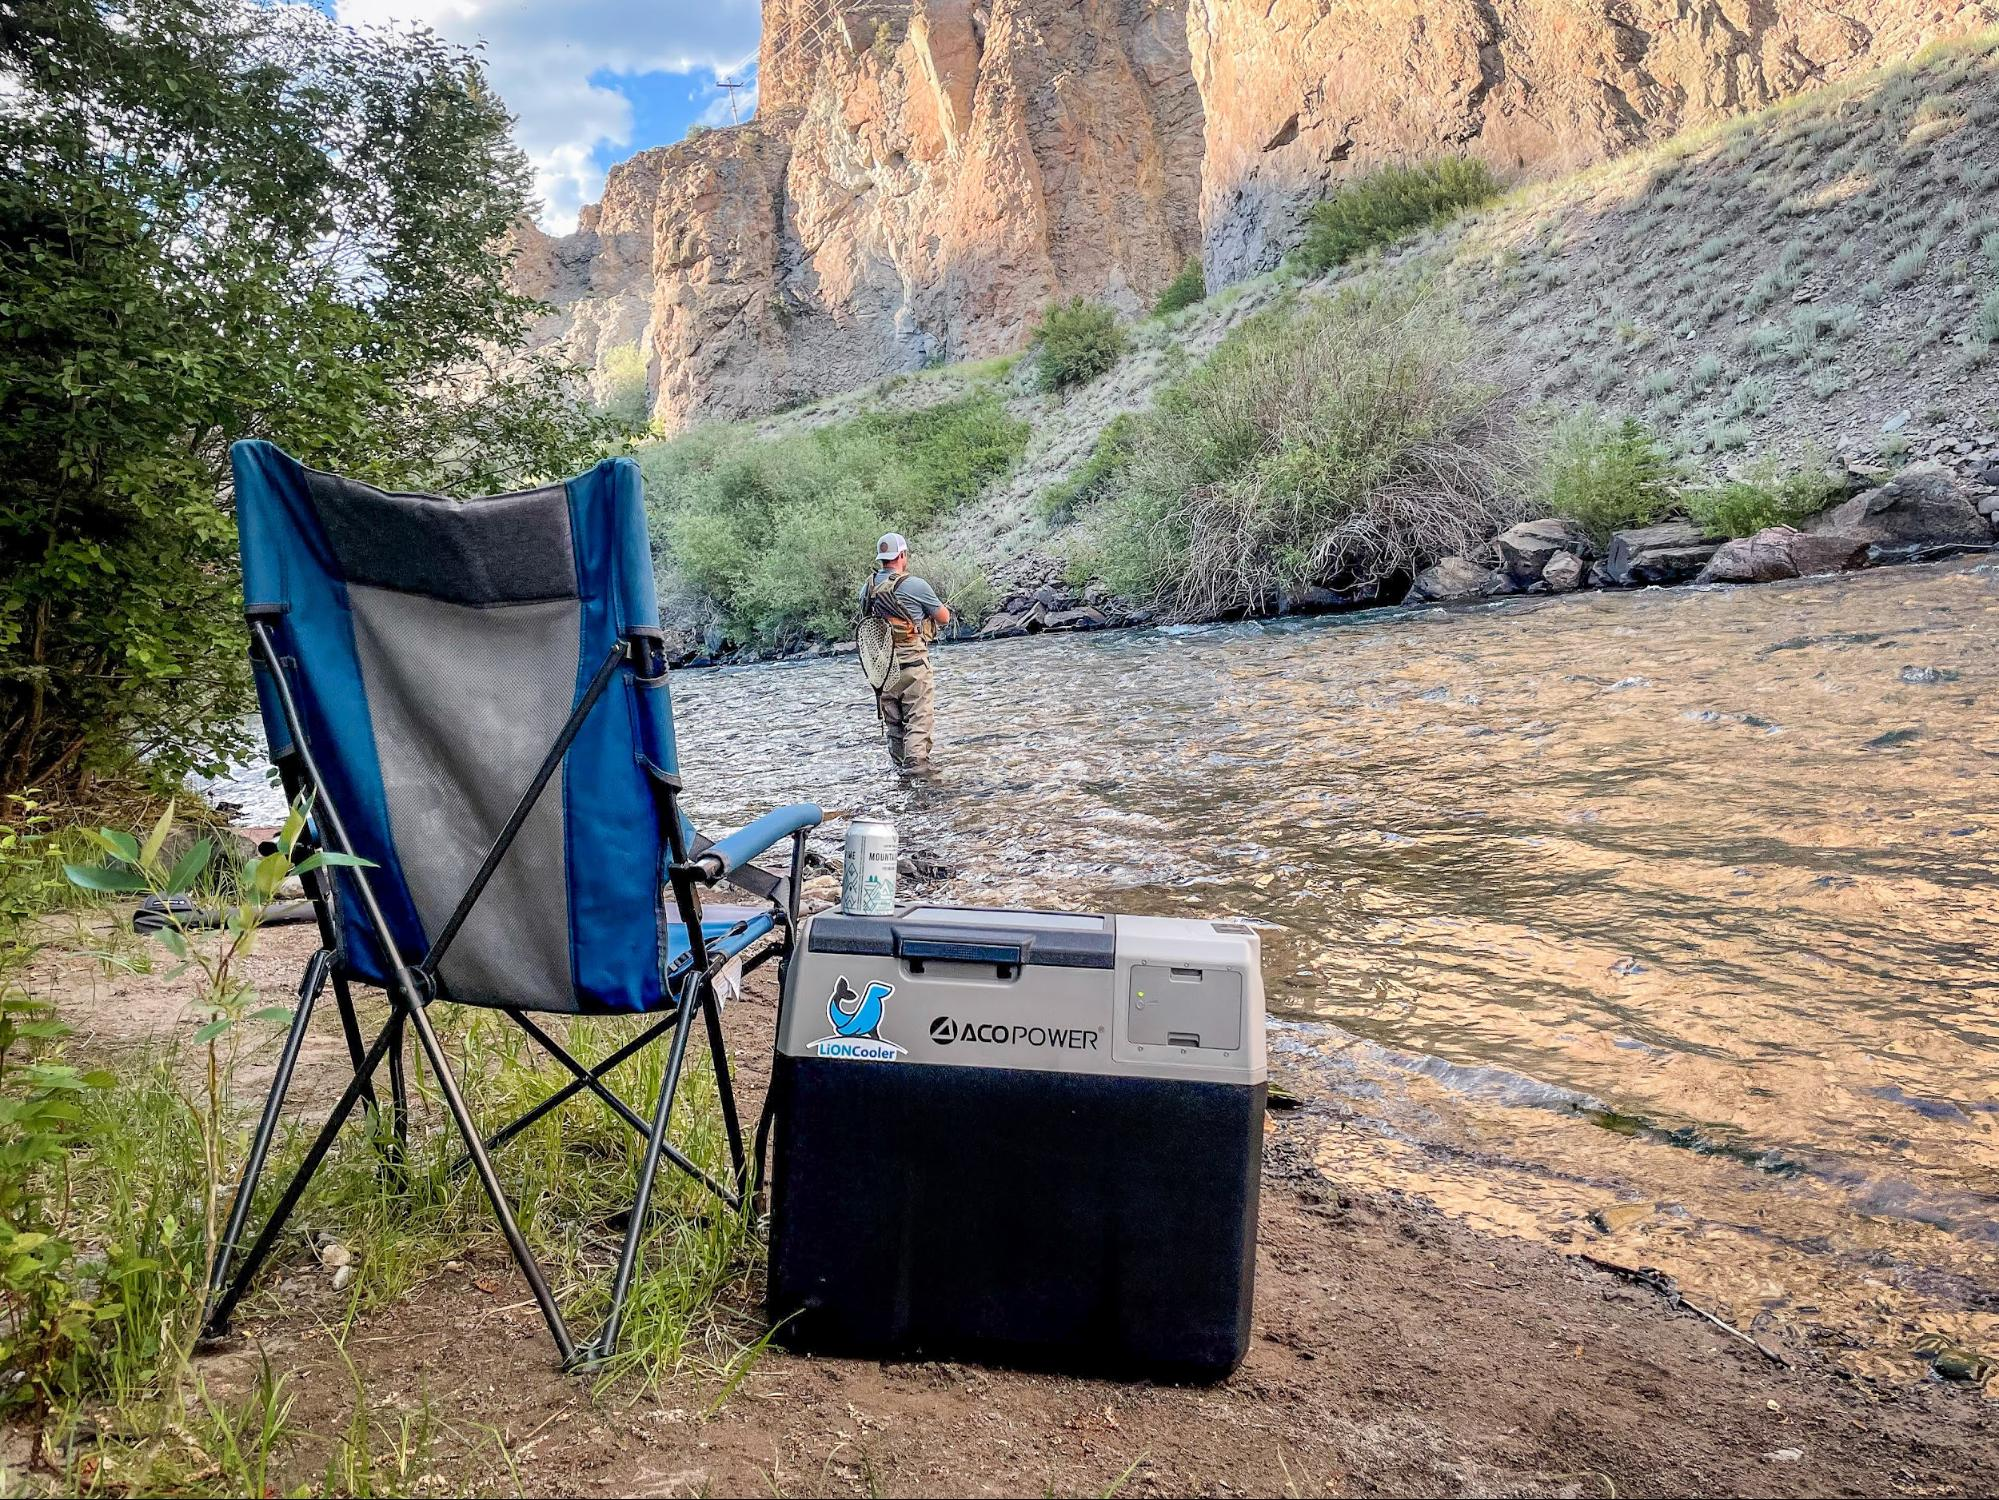 LionCooler X40A Portable Fridge Freezer Cooler by ACOPower next to a camp chair